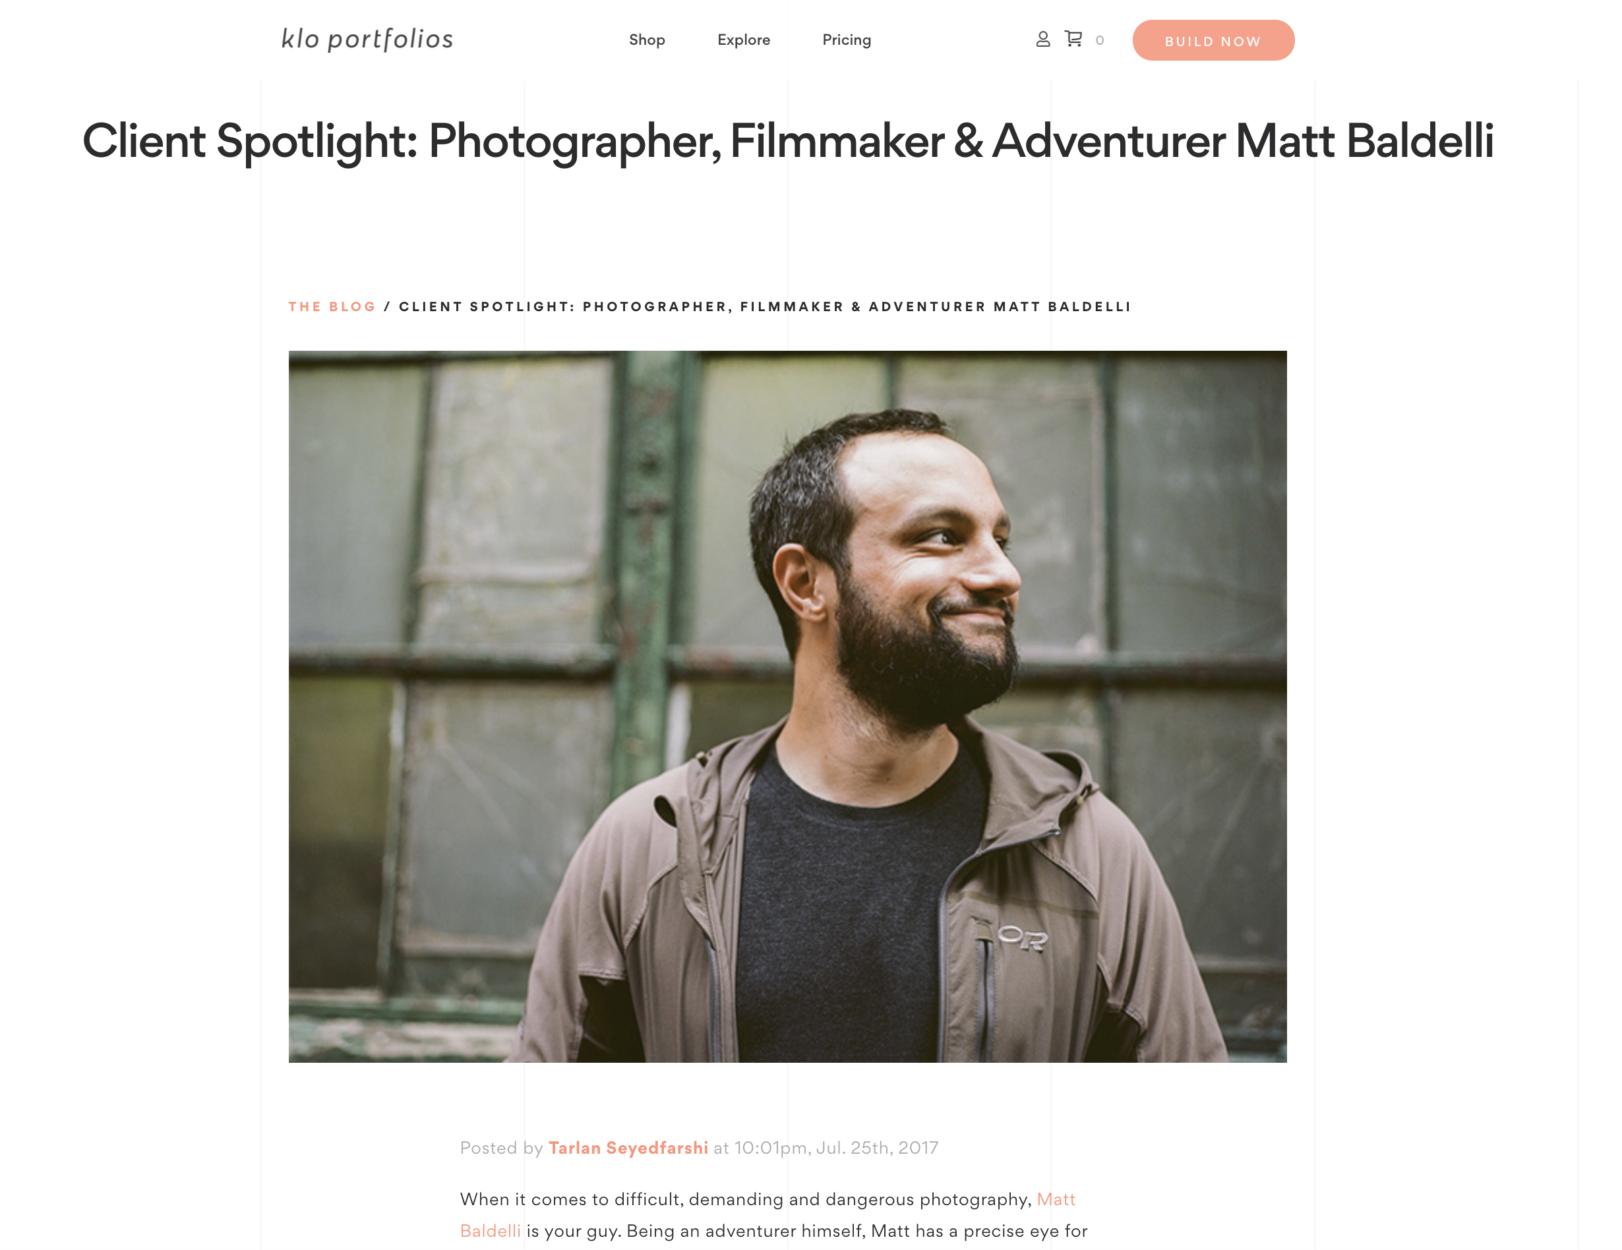 Klo Portfolio's Matt Baldelli Adventure Photographer